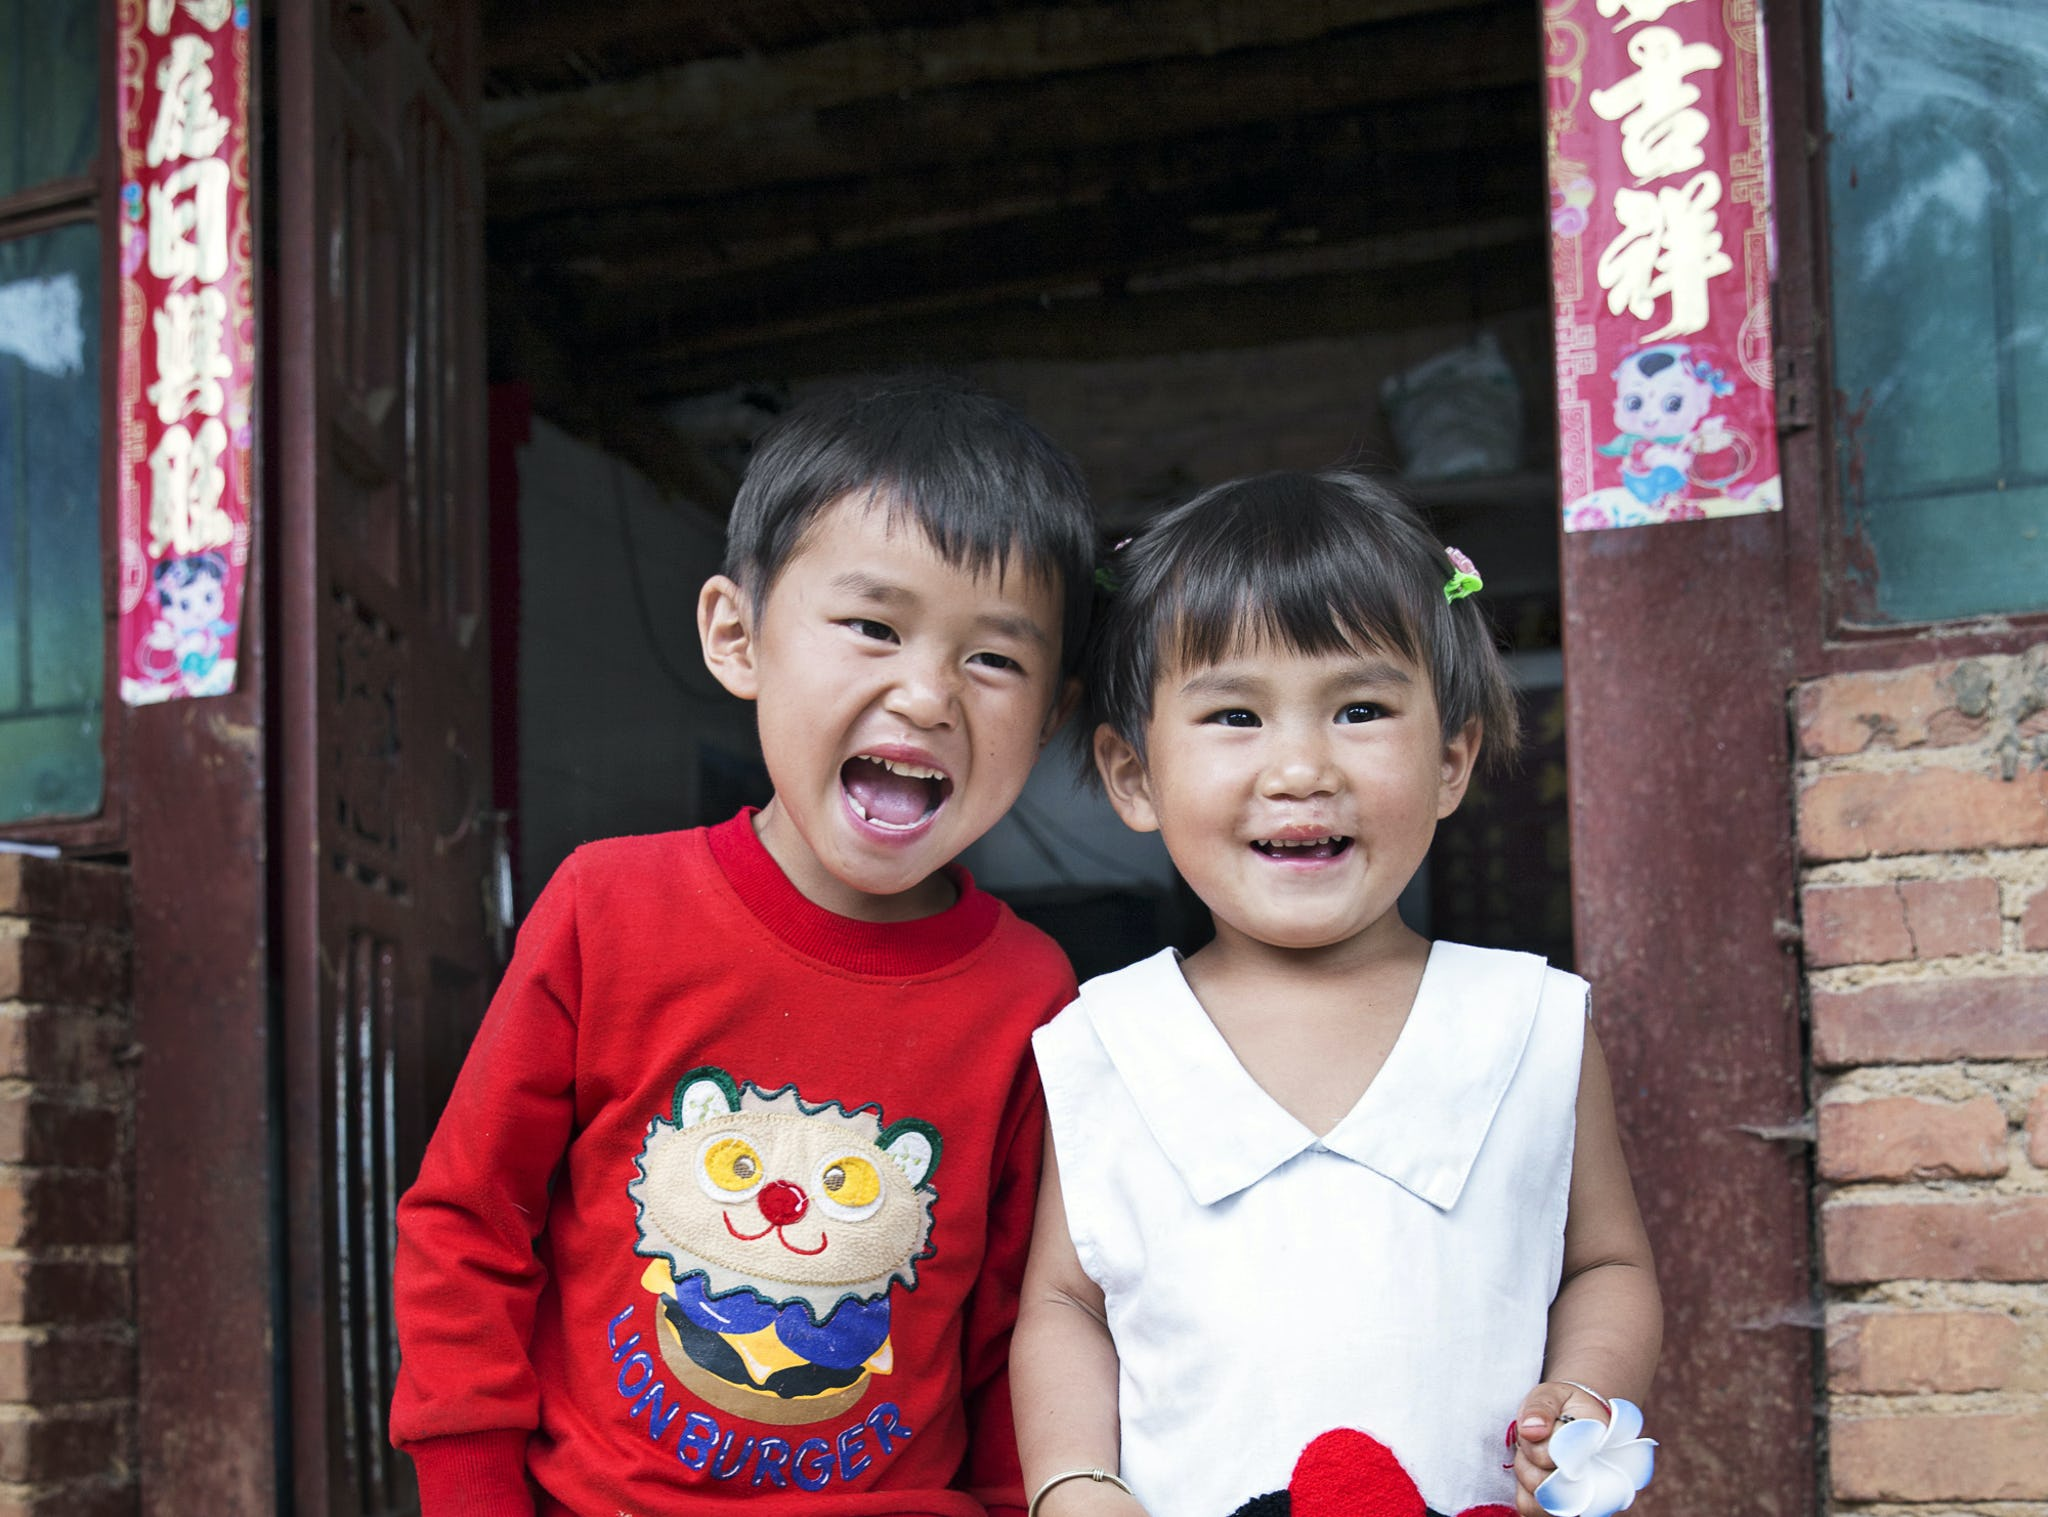 glada syskon efter operation i kina